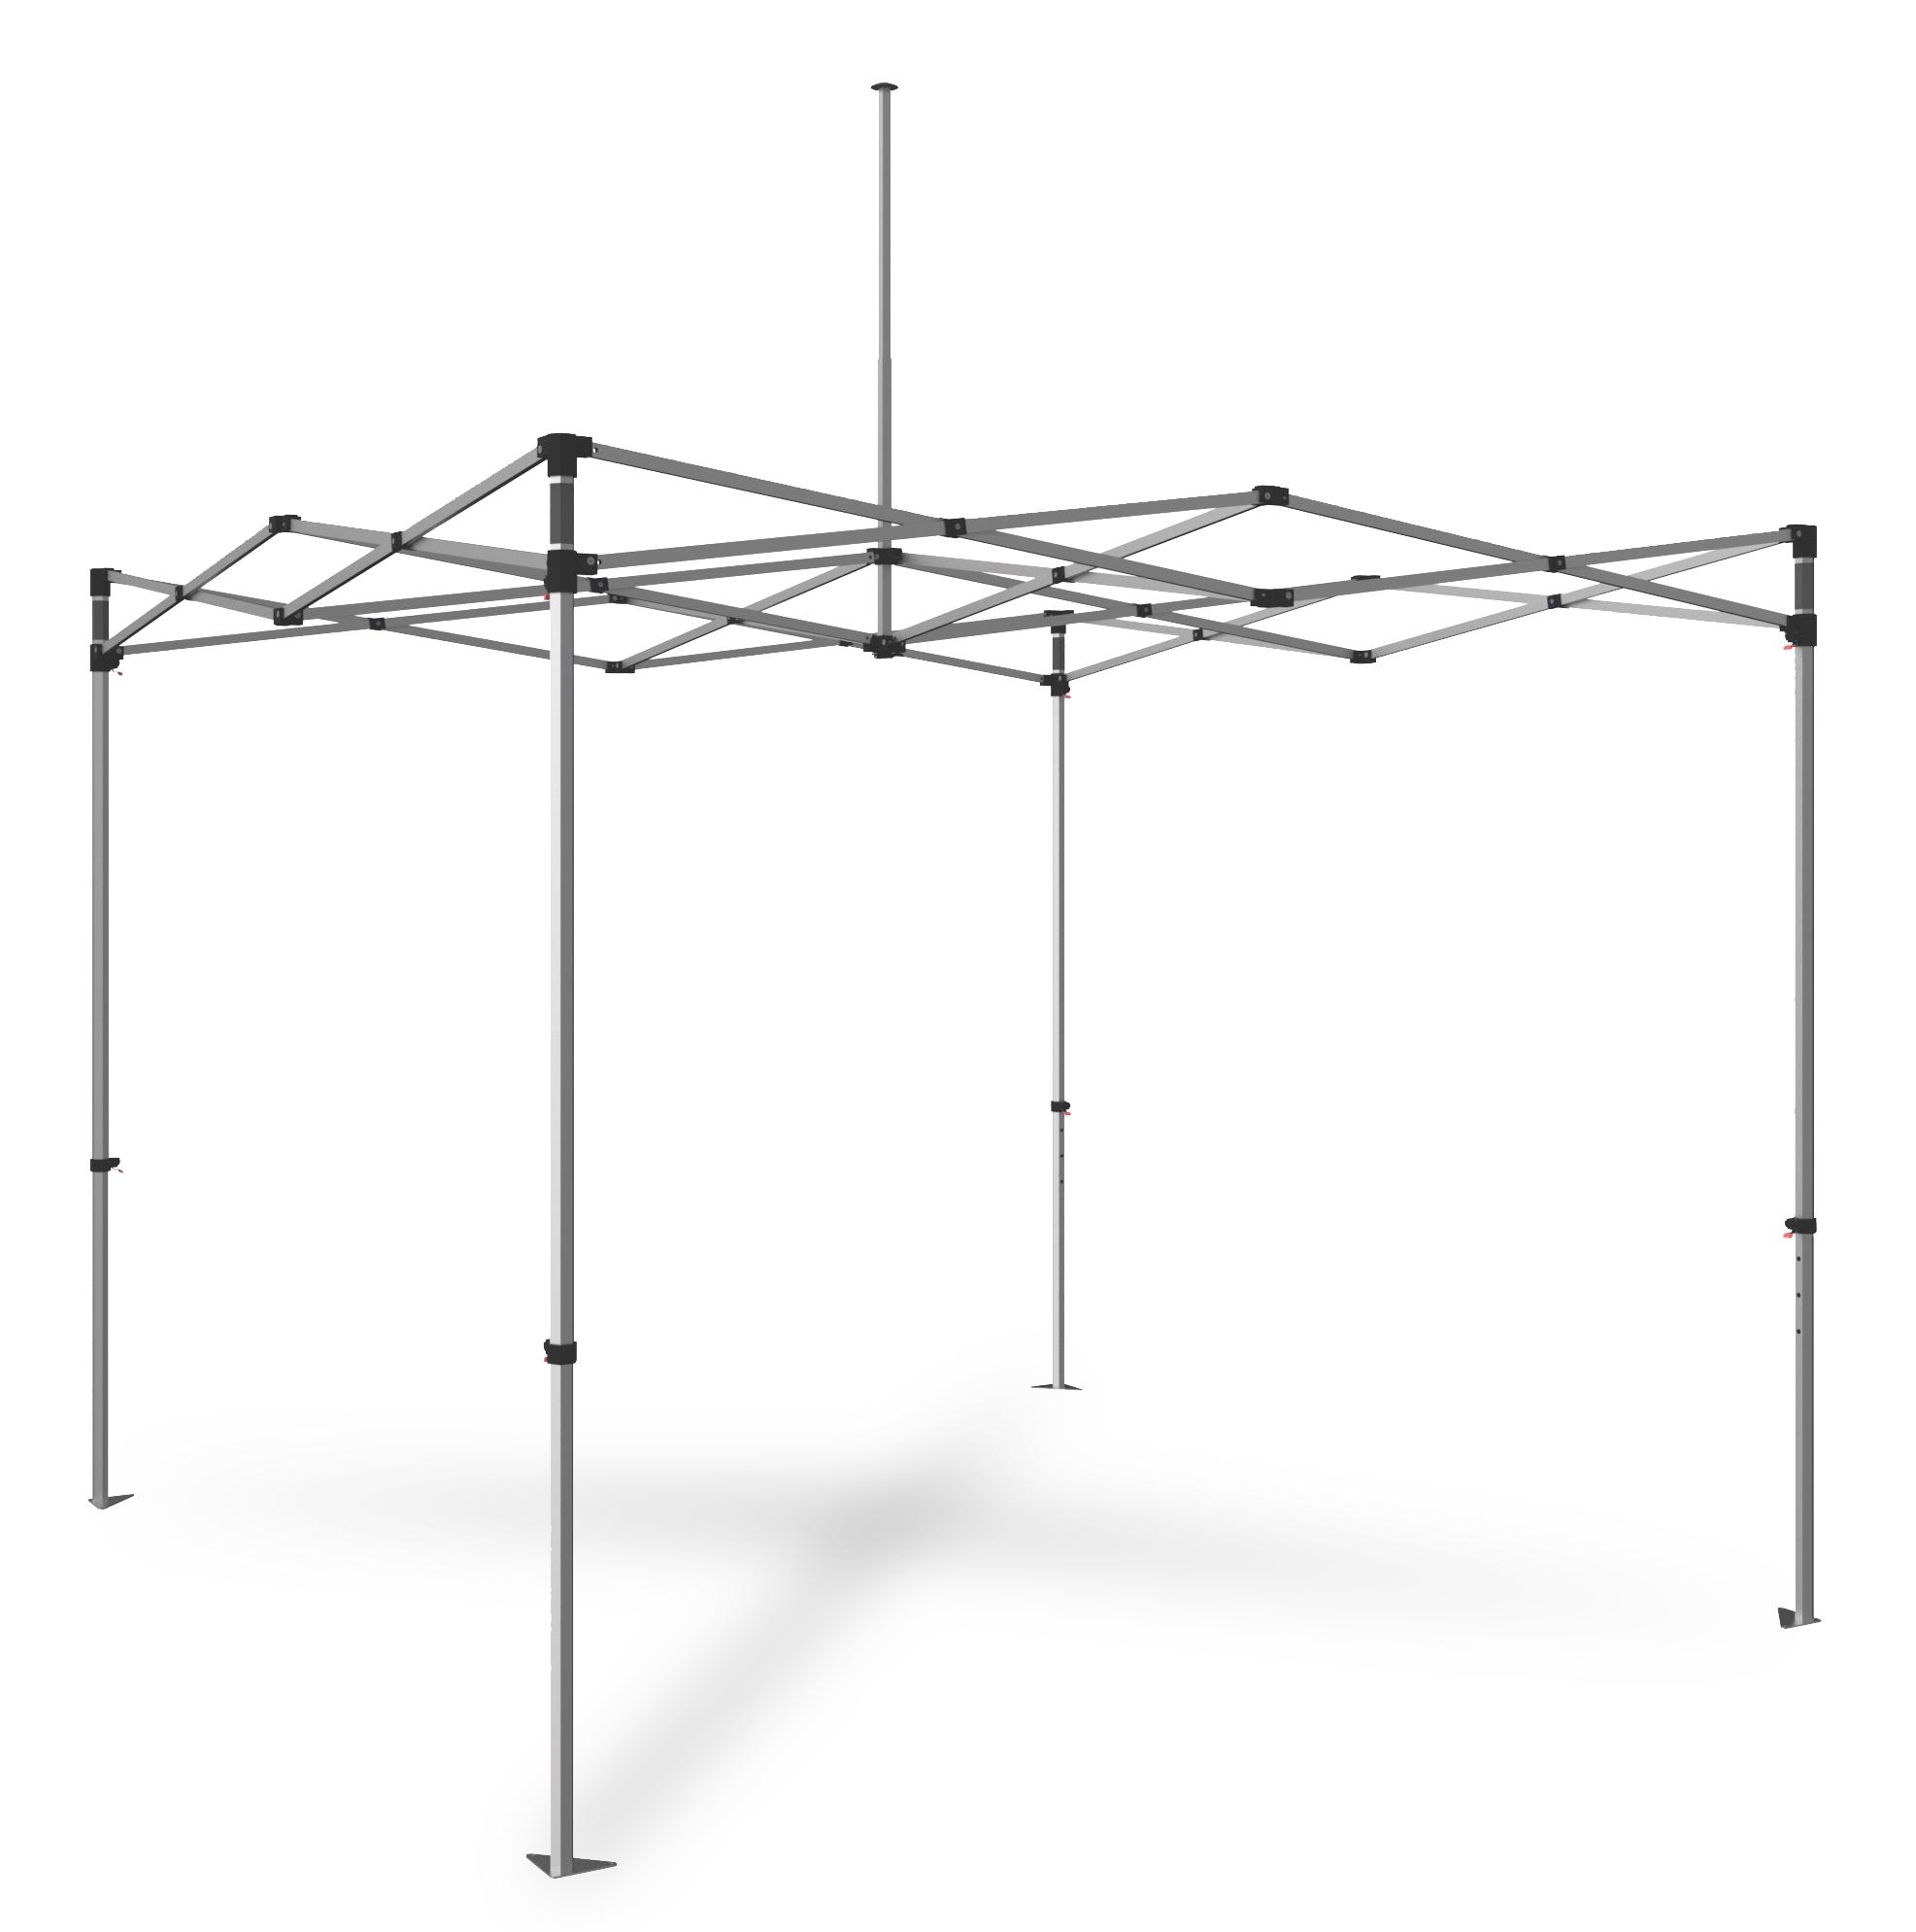 Gazebo Tent frame